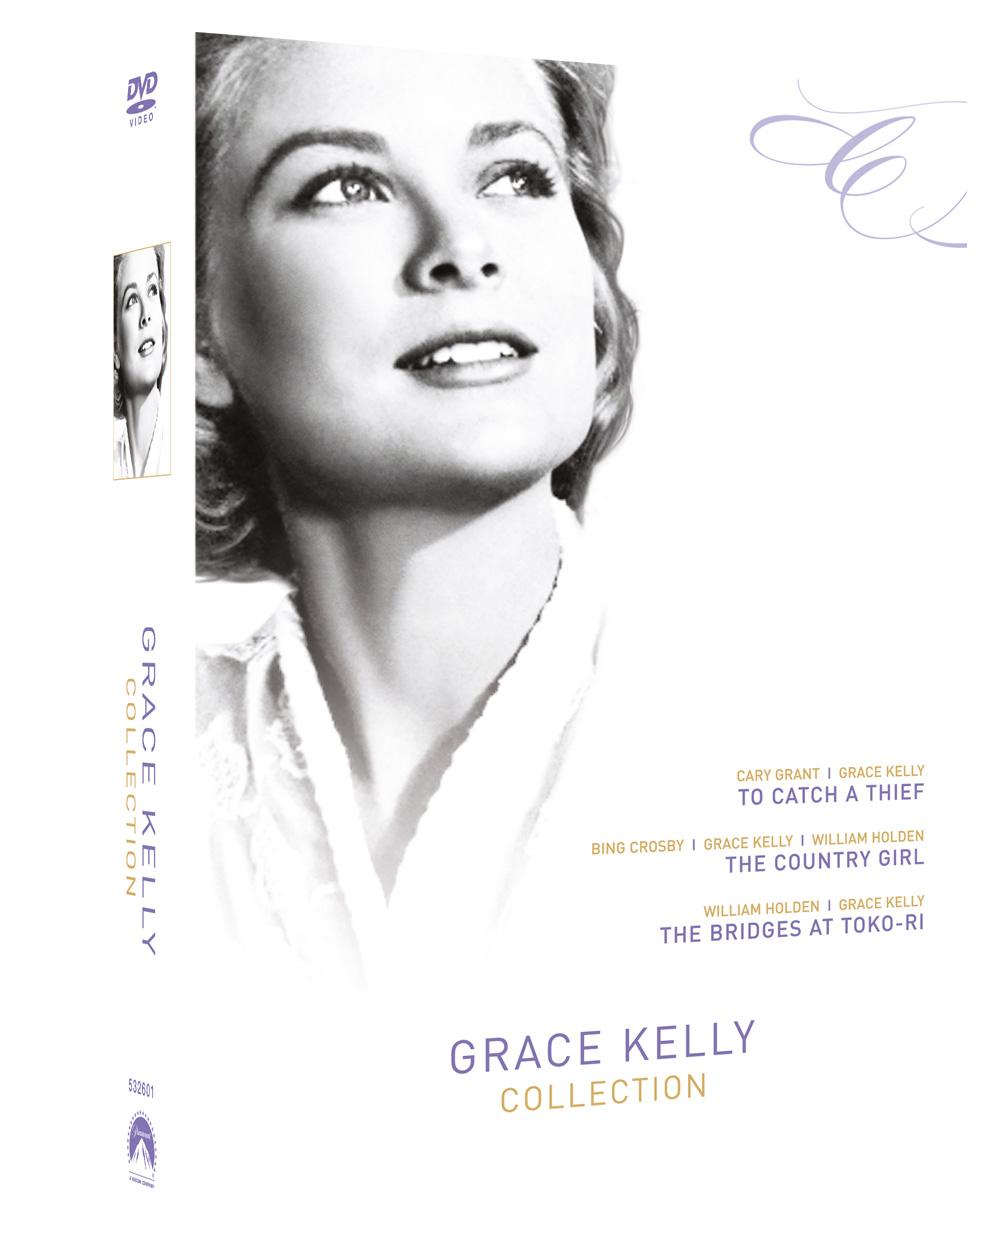 COLECTIA GRACE KELLY (Pachet  3 discuri)